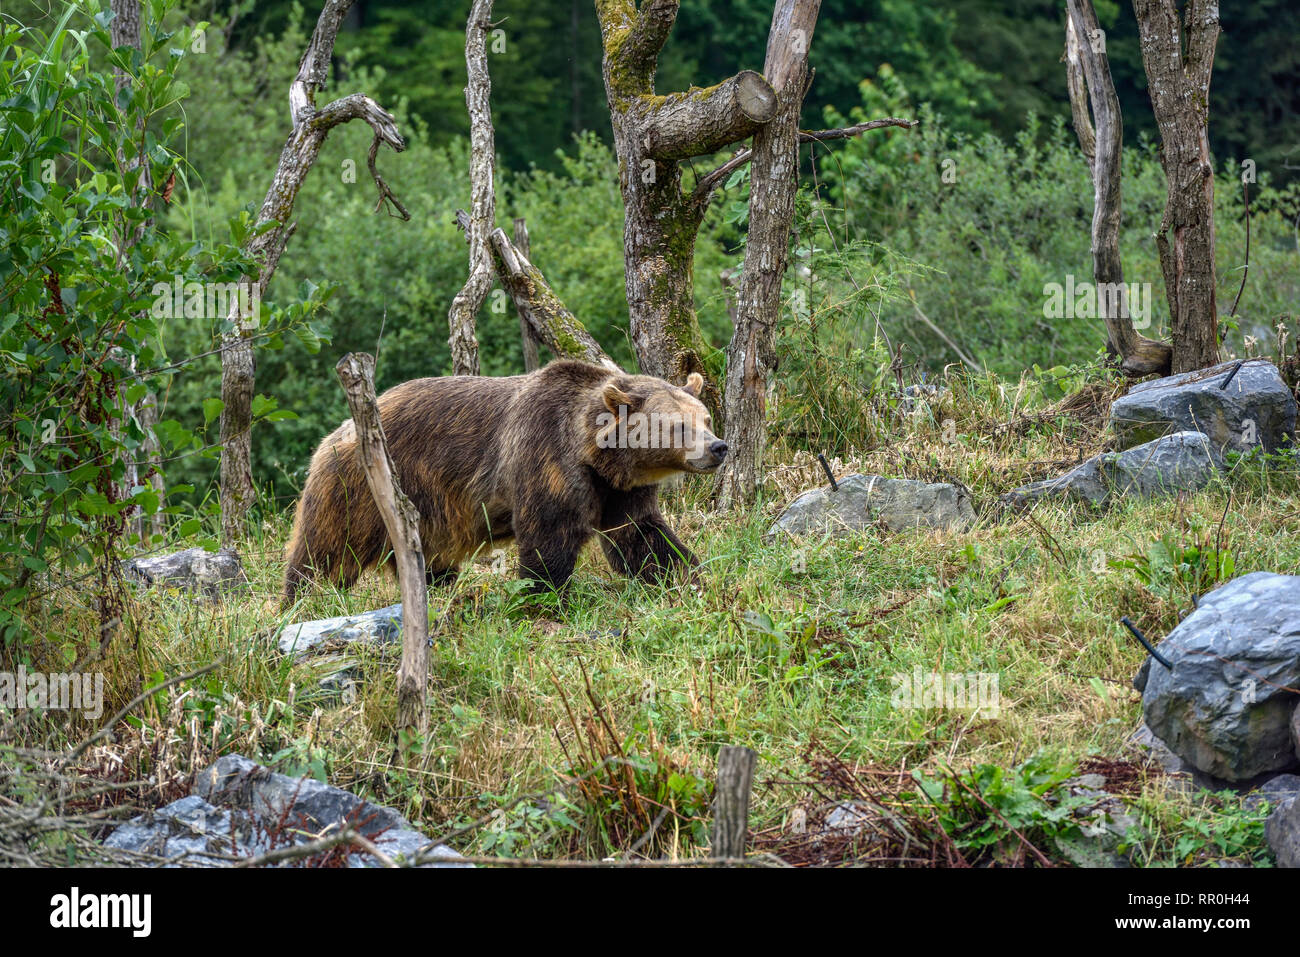 zoology / animals, mammal (mammalia), European brown bear or Eurasian brown bear (Ursus arctos arctos), Additional-Rights-Clearance-Info-Not-Available - Stock Image